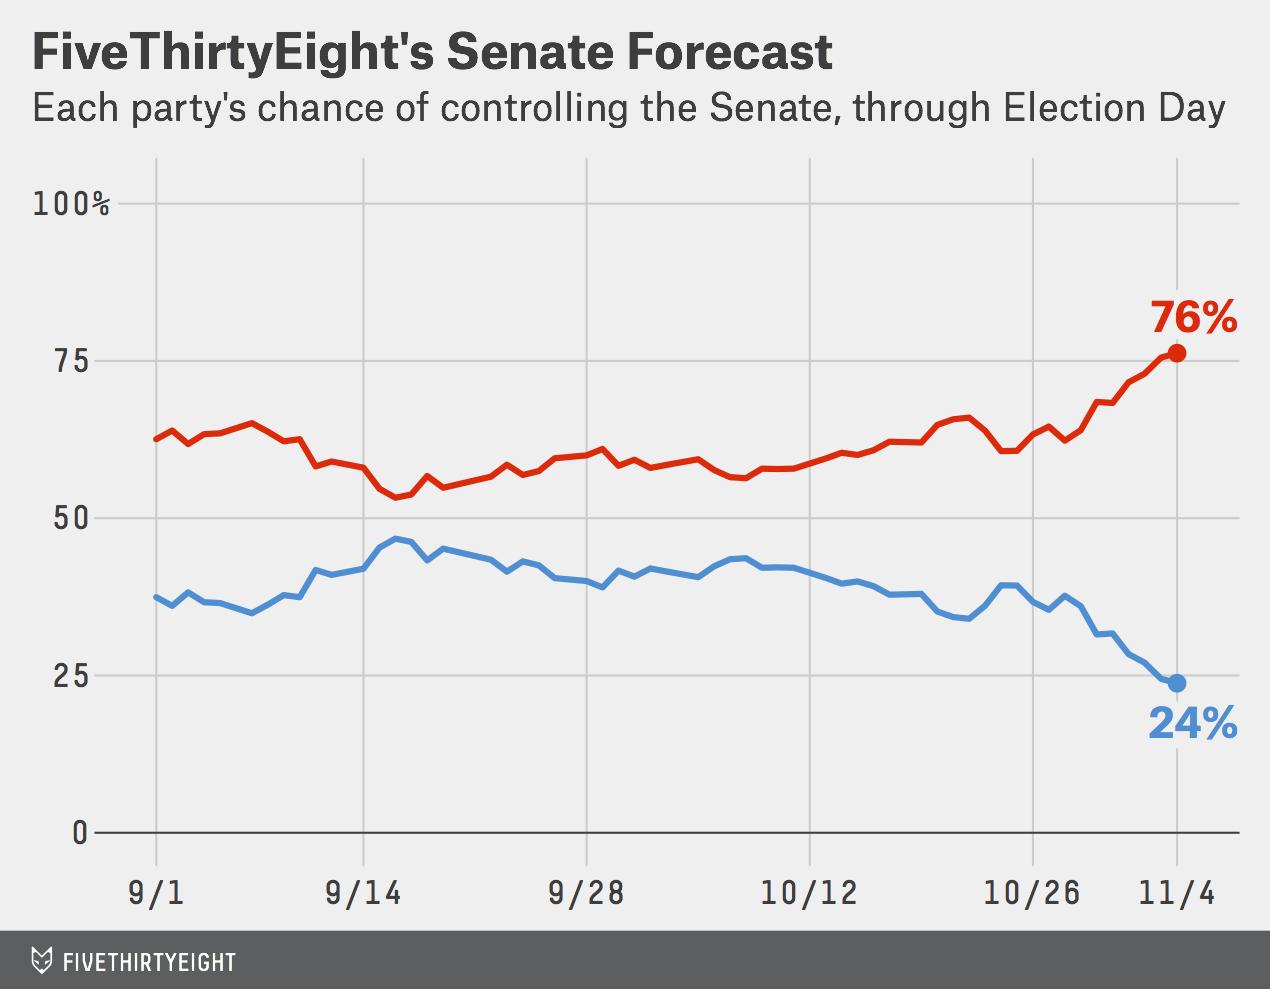 silver-senate-forecast-linechart